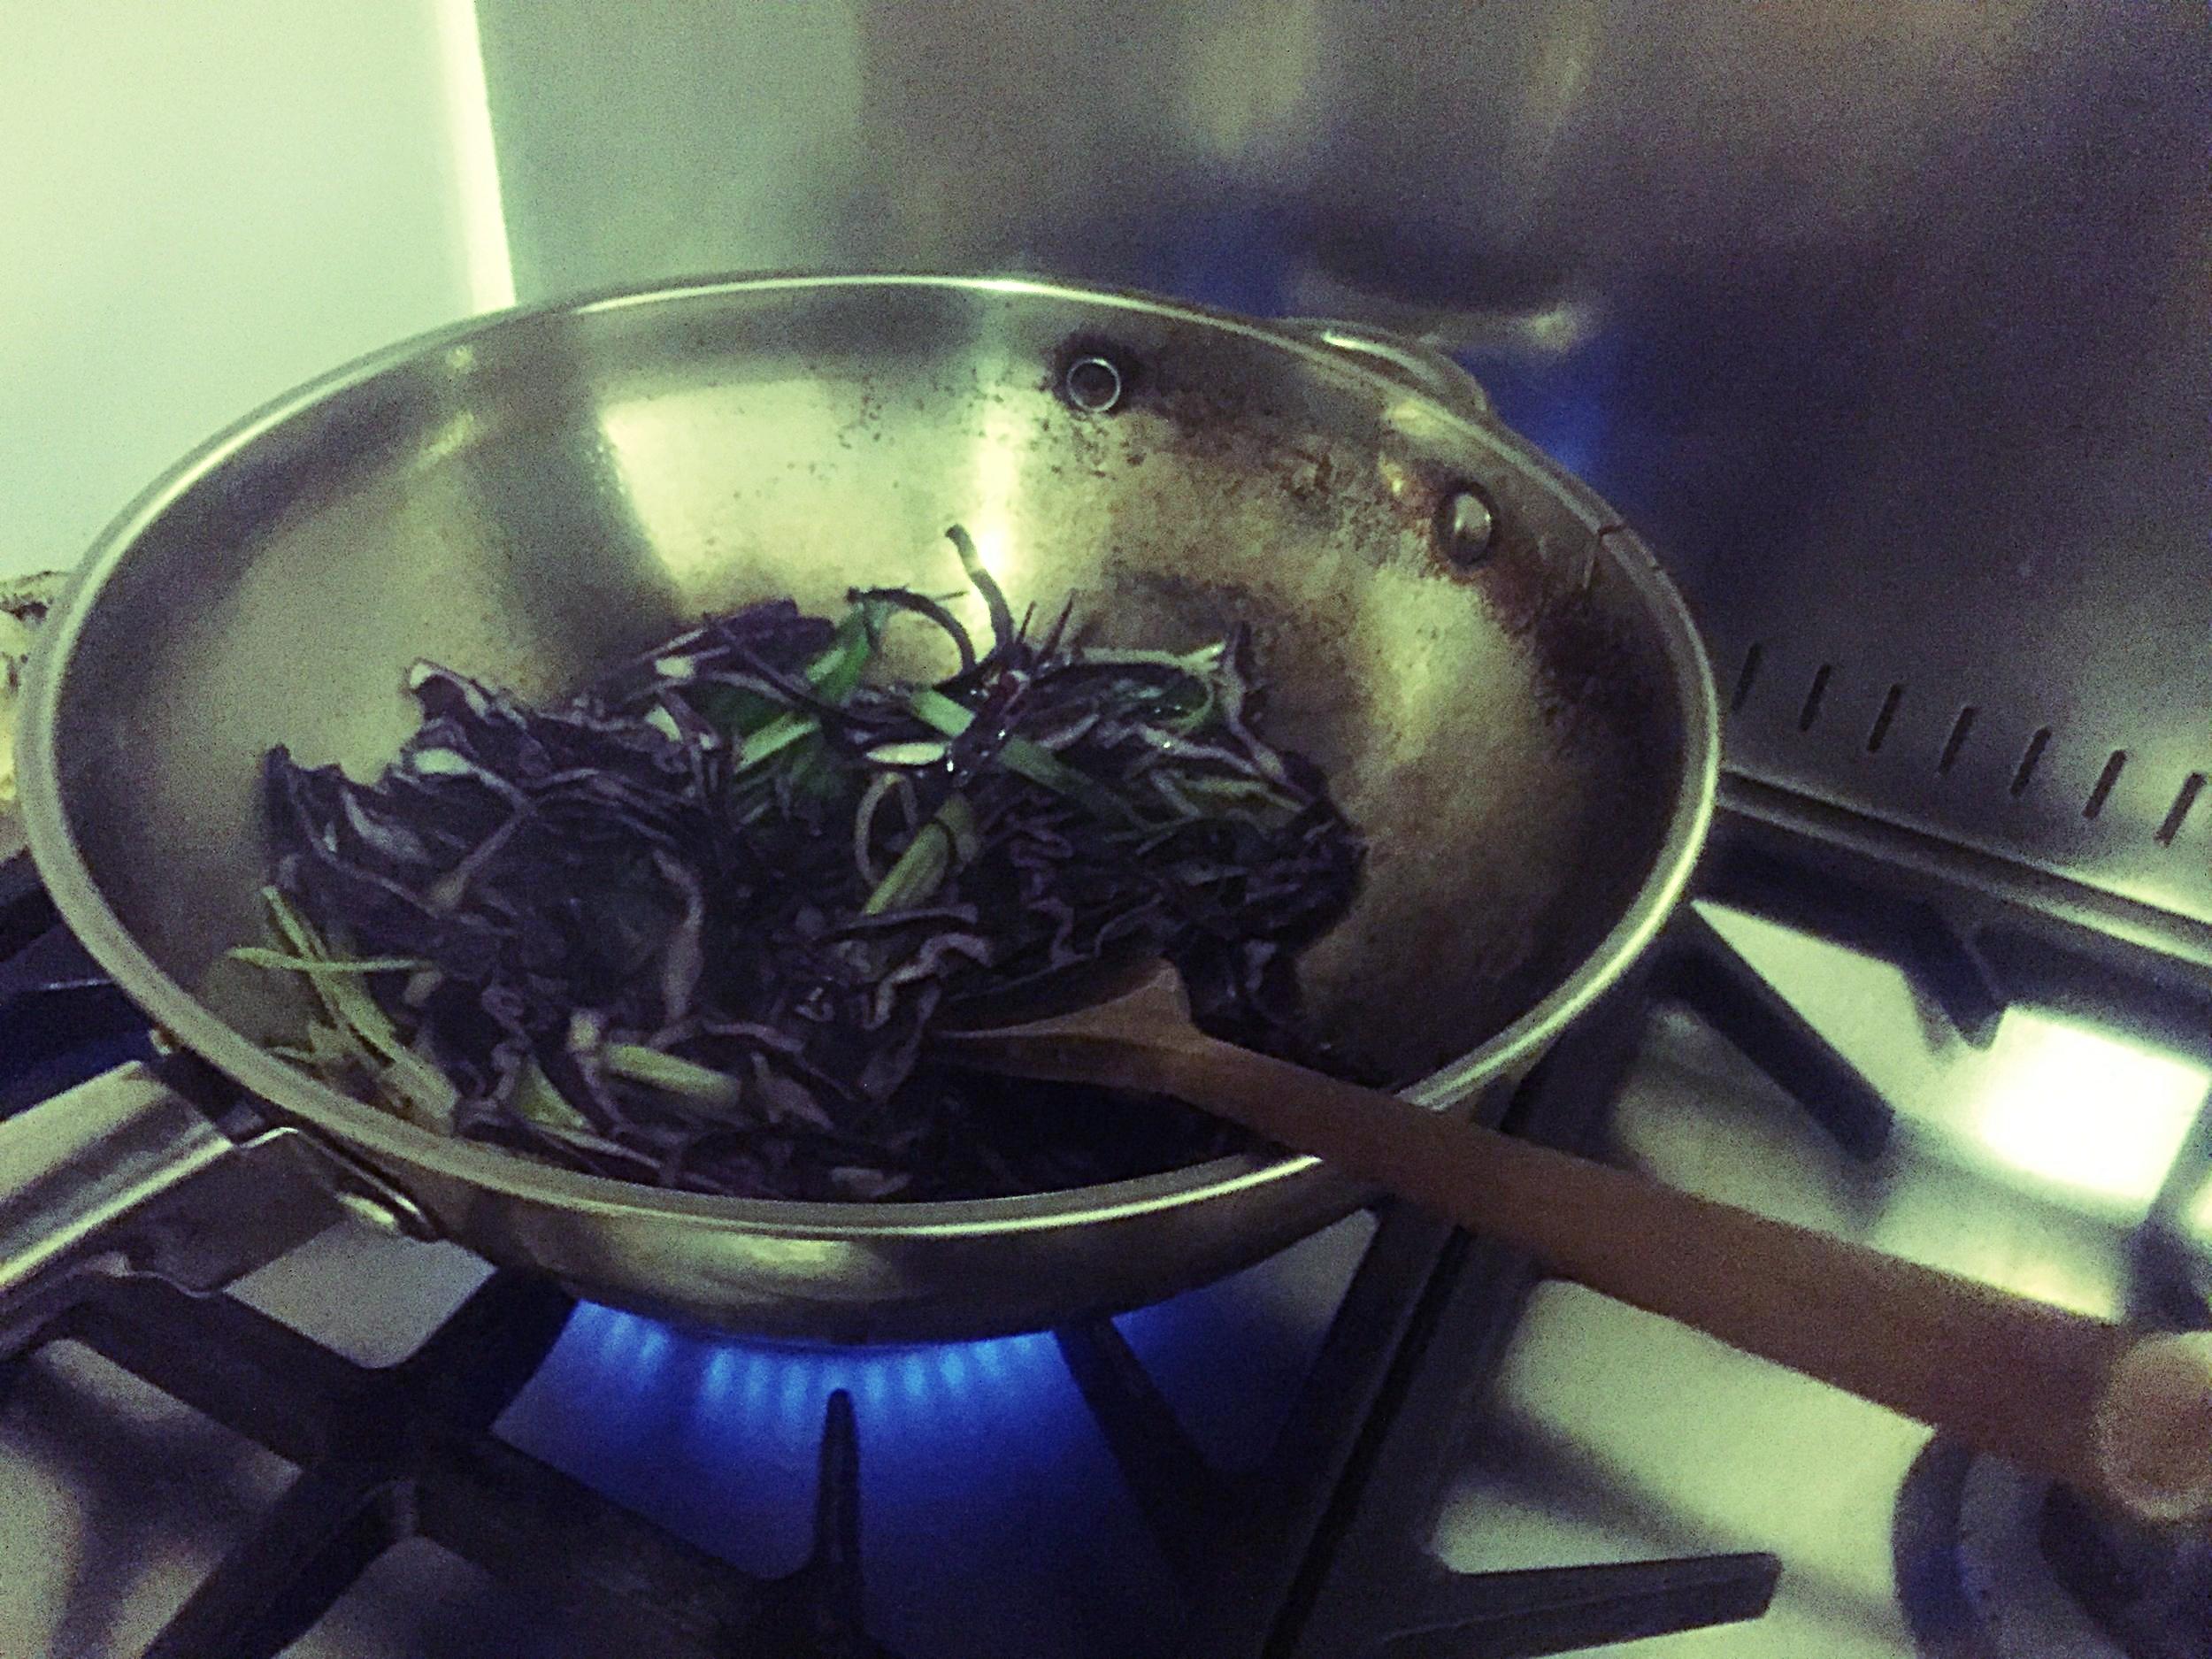 Stir Fry Veg in a Hot Wok